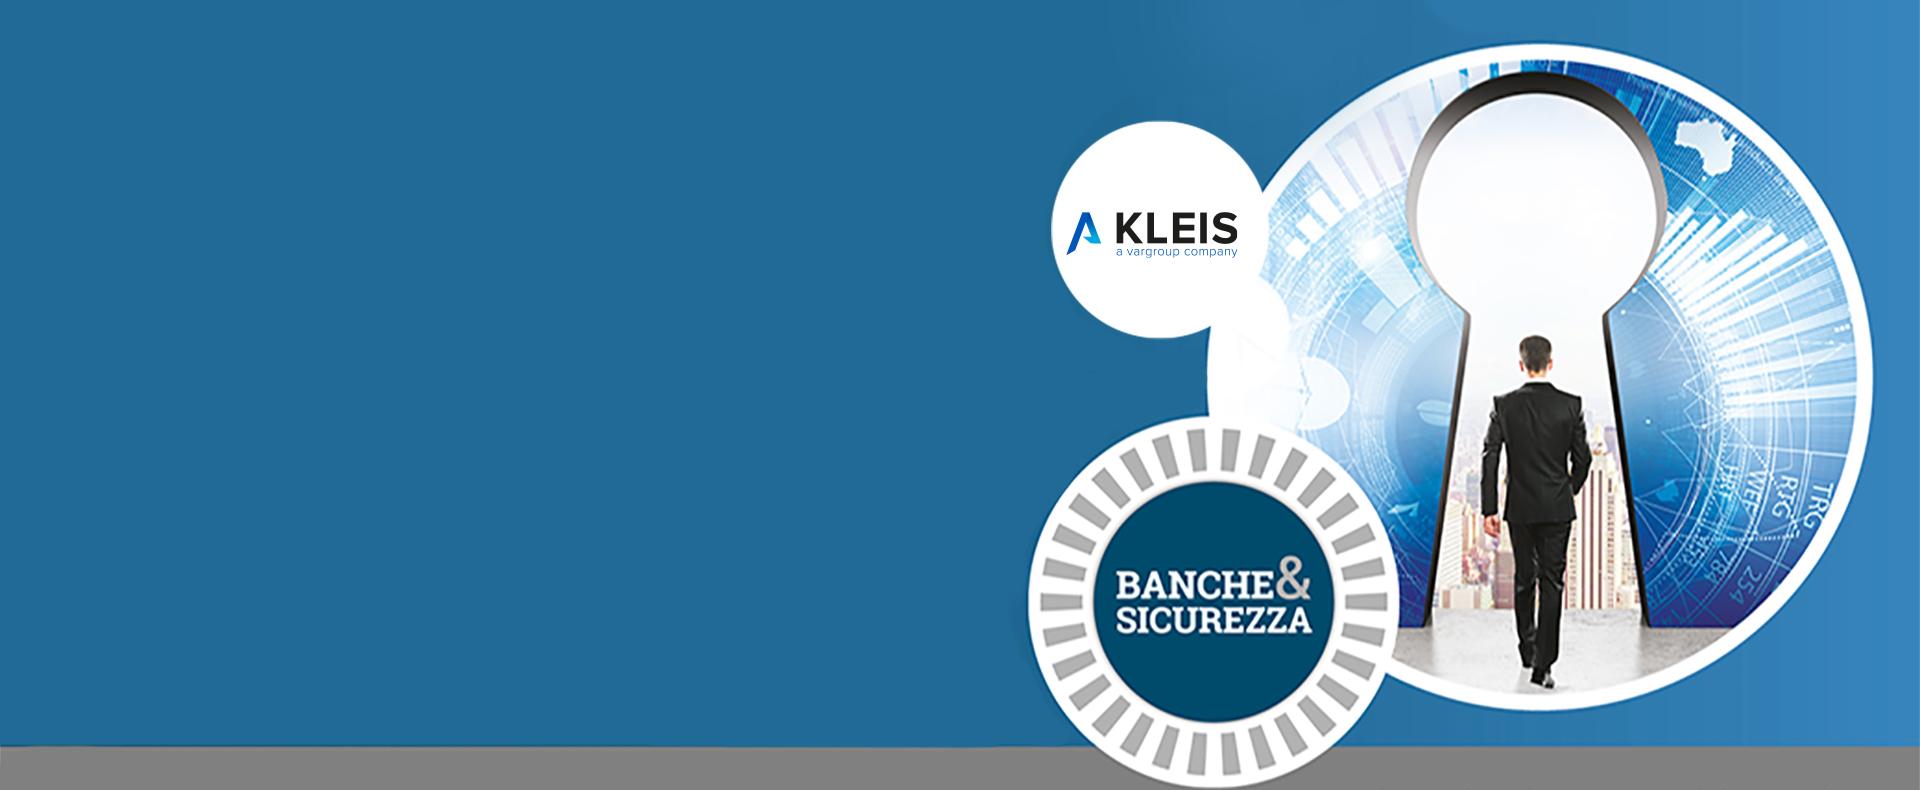 BANCHE E SICUREZZA 2020: KLEIS INTERVIENE SUL TEMA FRAUD PREVENTION AND MANAGEMENT